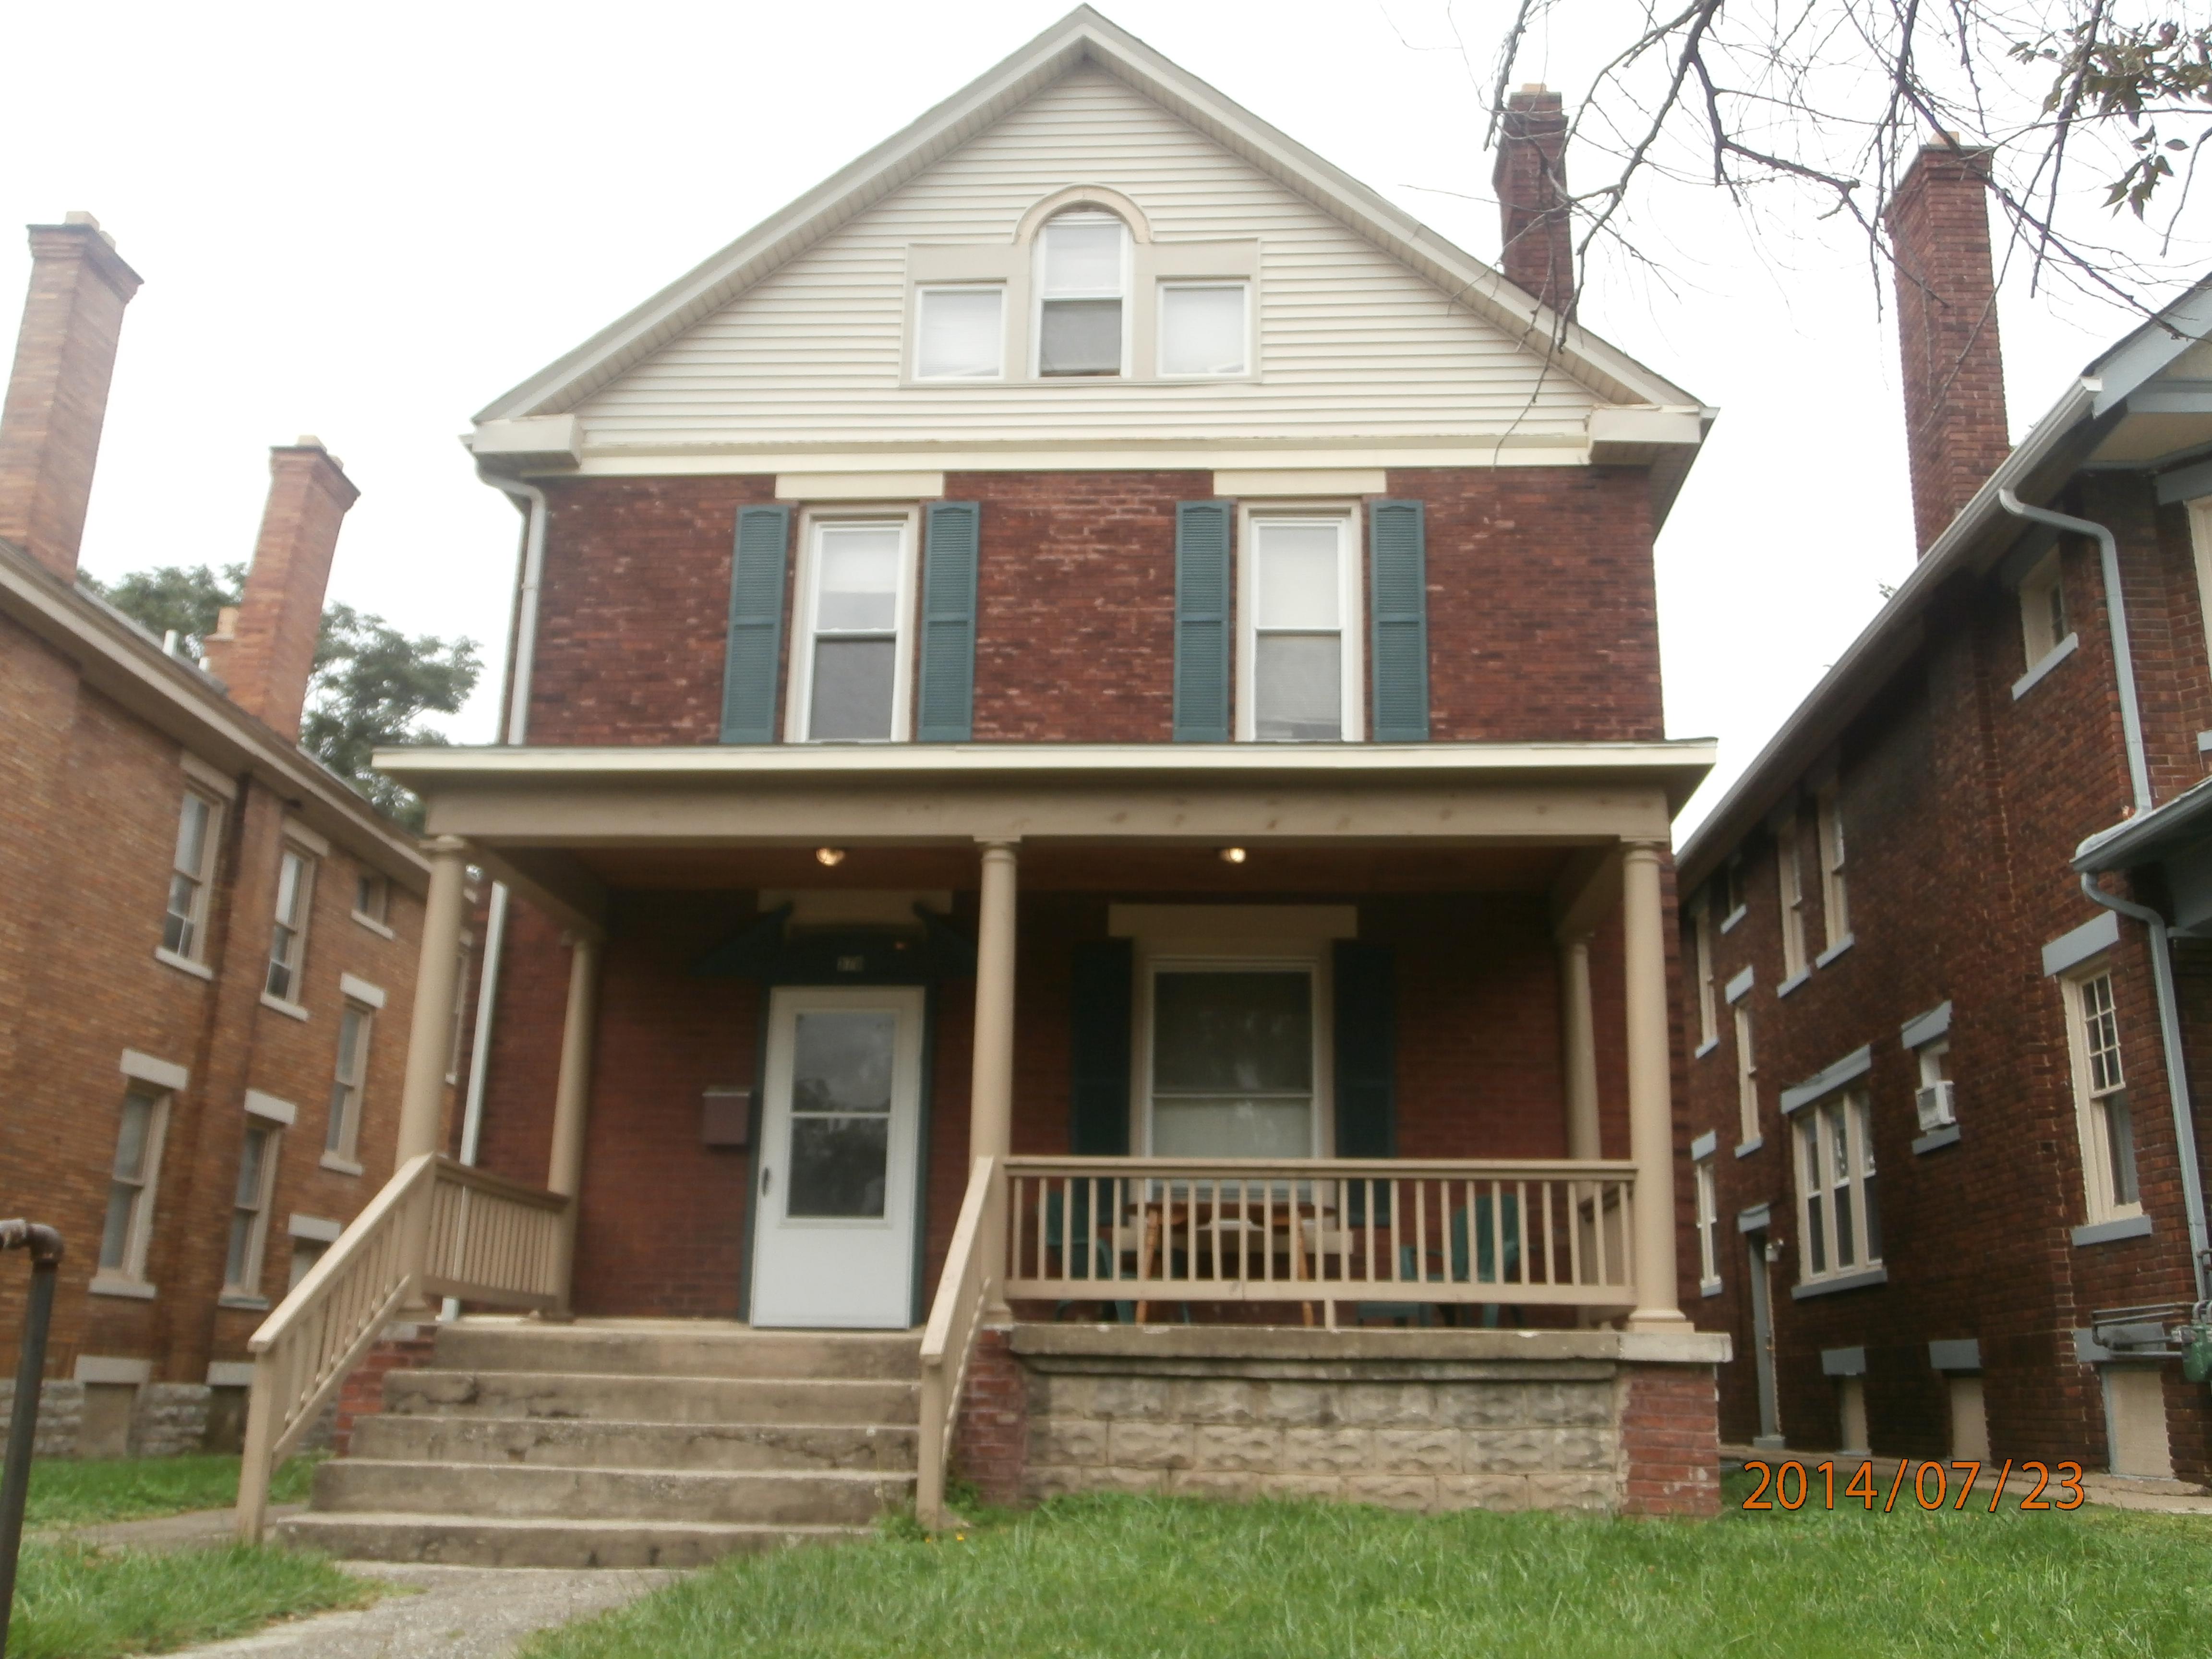 370 Chittenden Ave